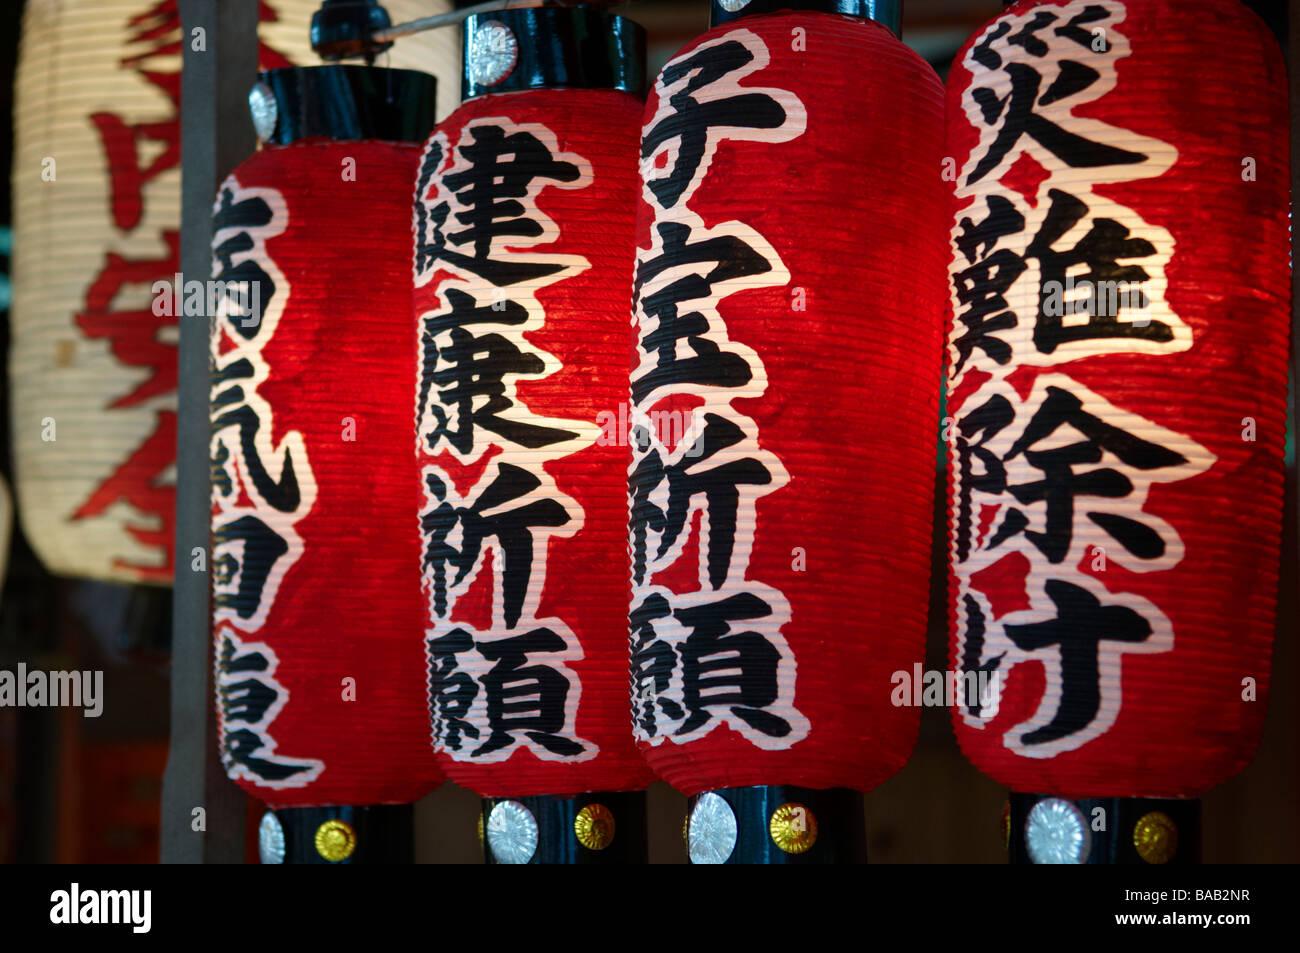 Colourful prayer lanterns and Japanese script at the Buddhist Kiyomizu-dera temple in Kyoto, Japan - Stock Image